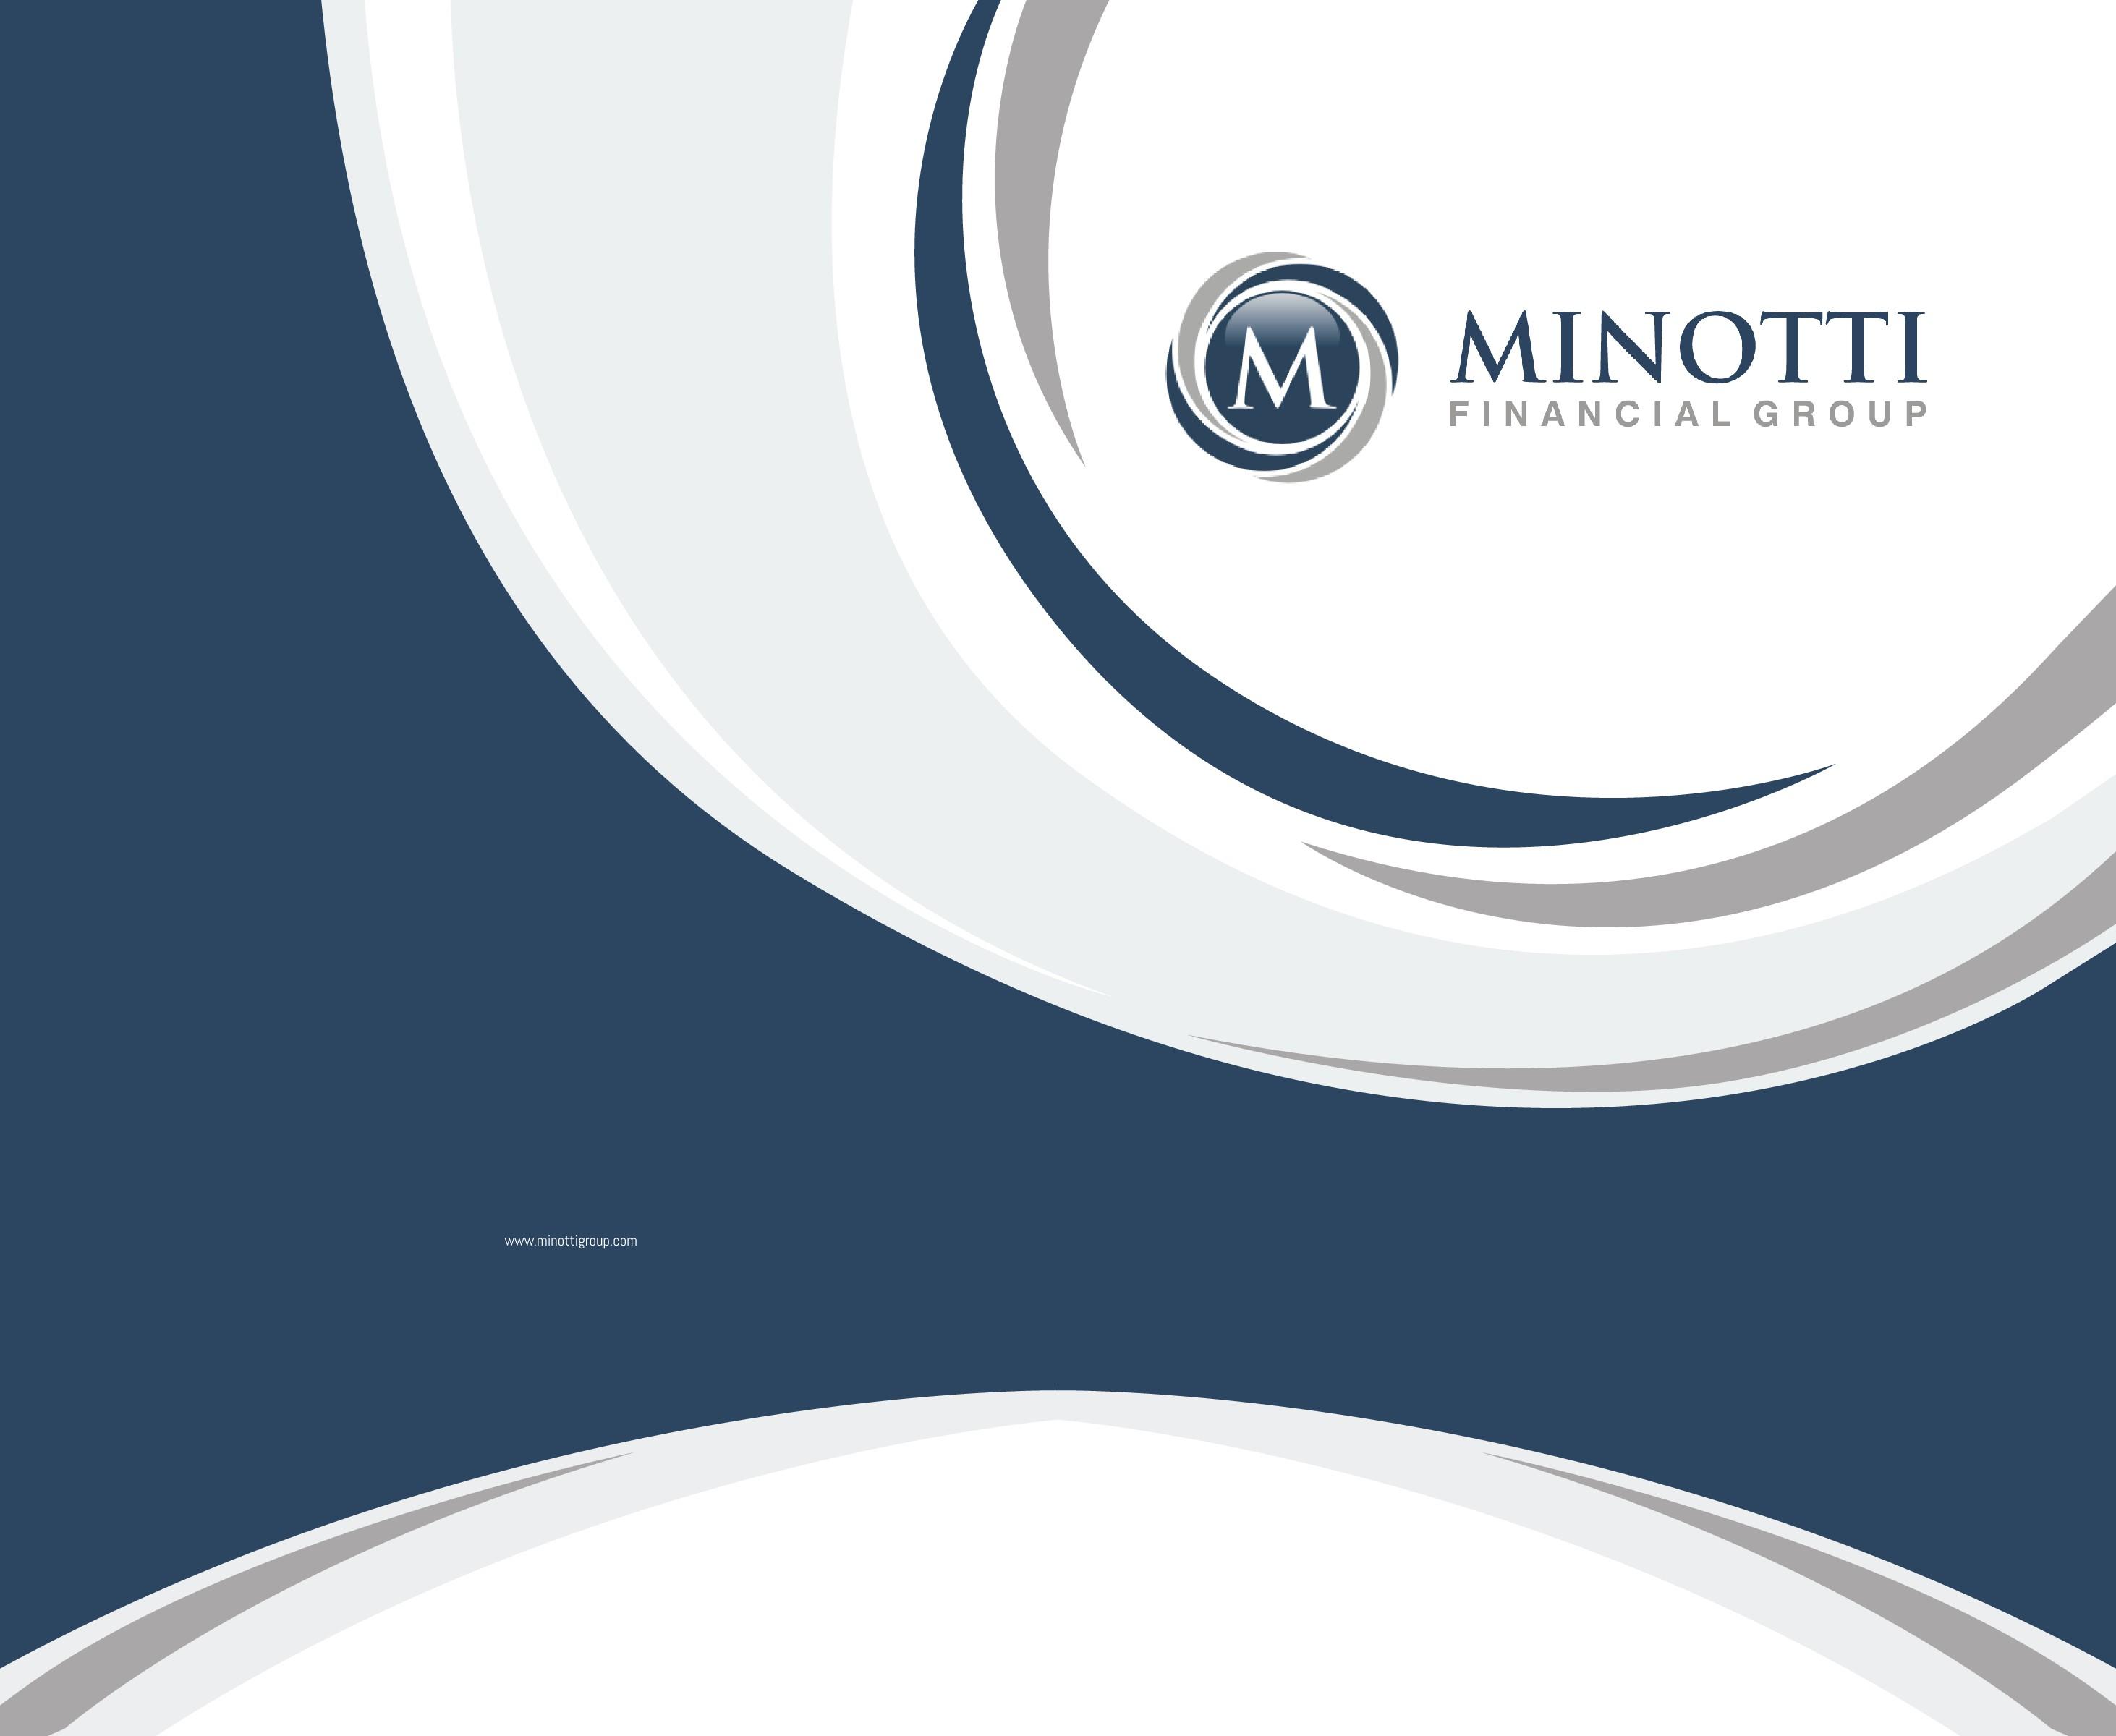 Minotti Financial Folder Design